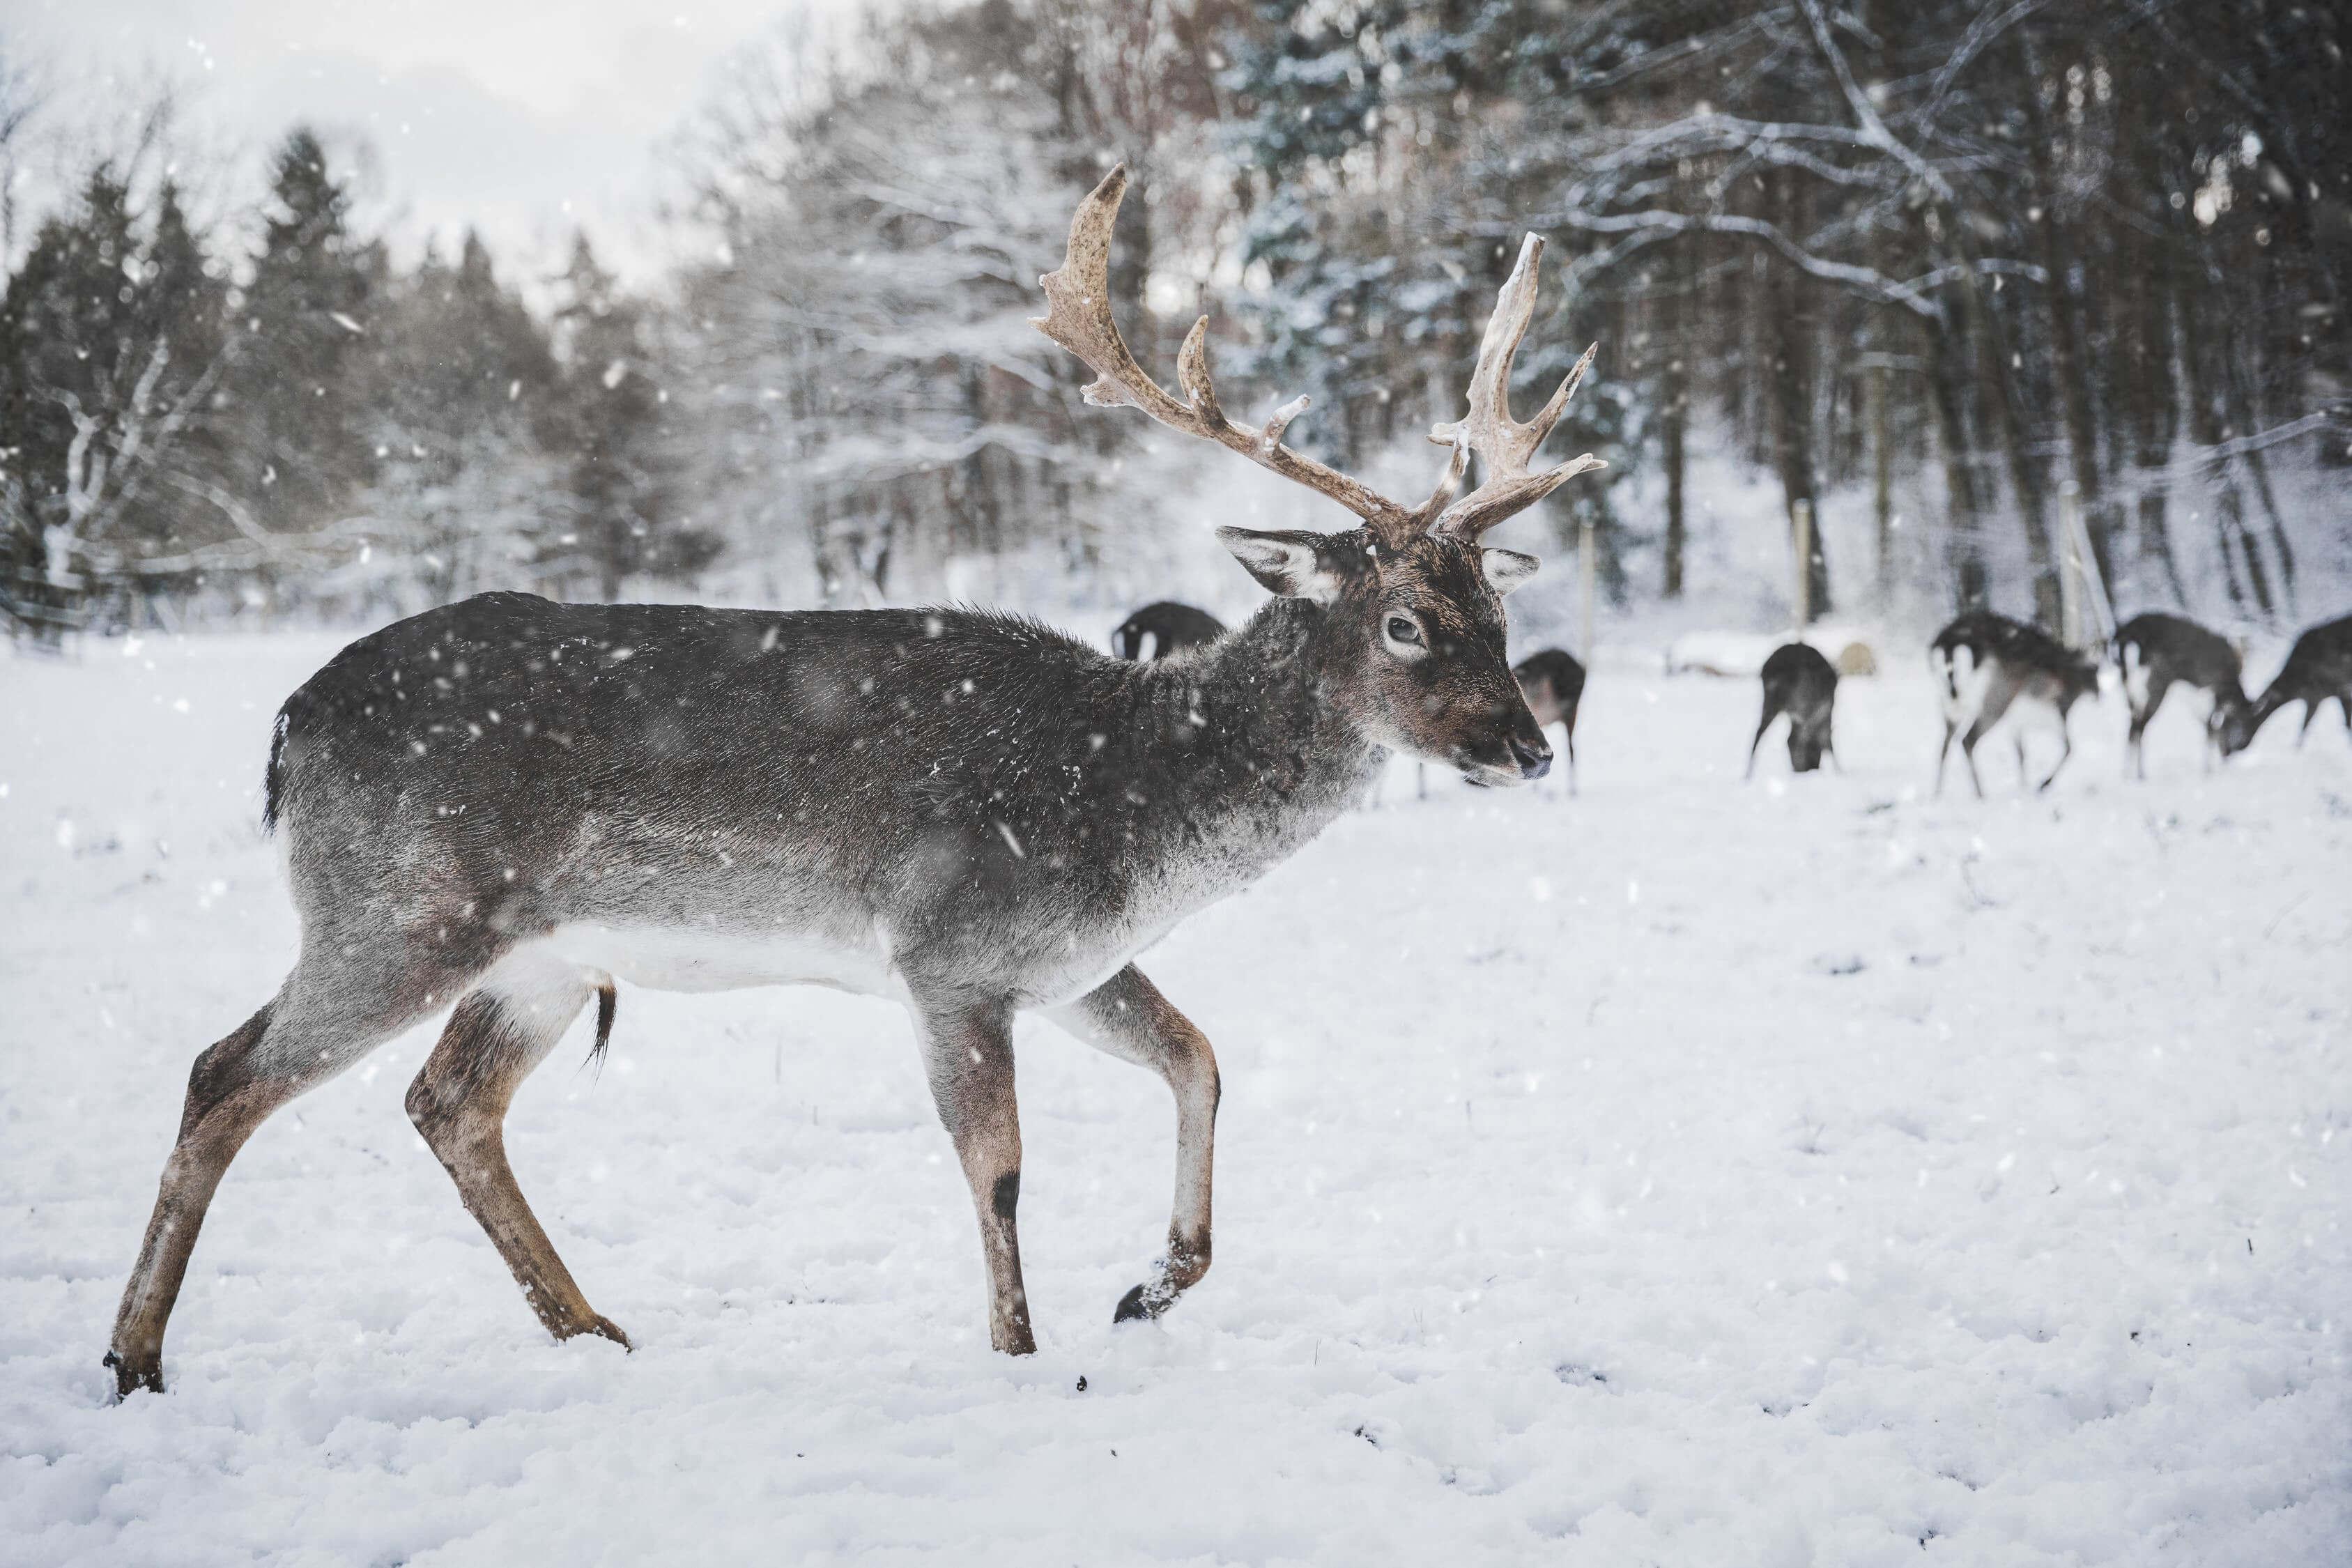 a reindeer in snow